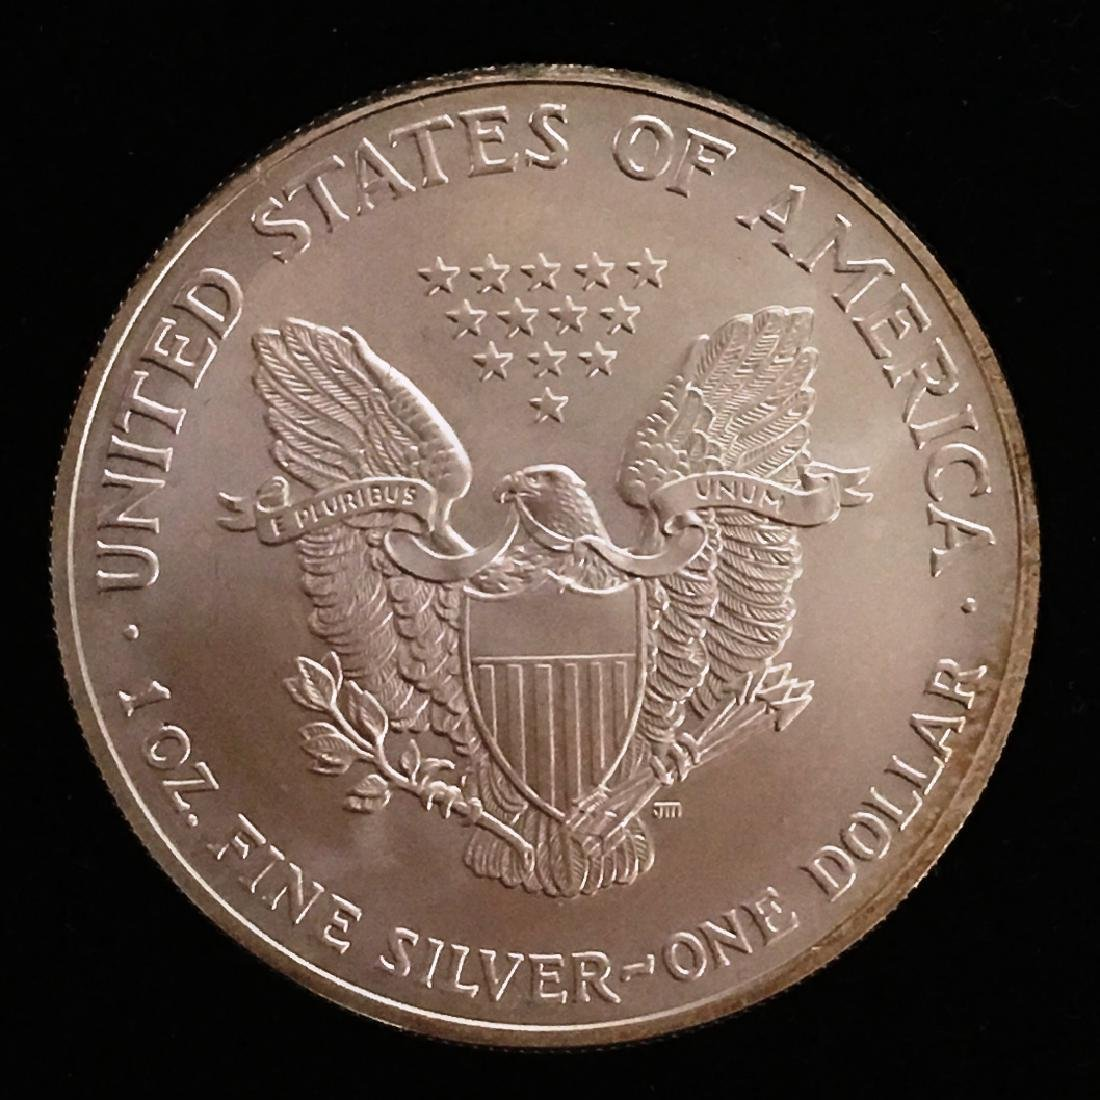 2003 SILVER EAGLE $1 - 2